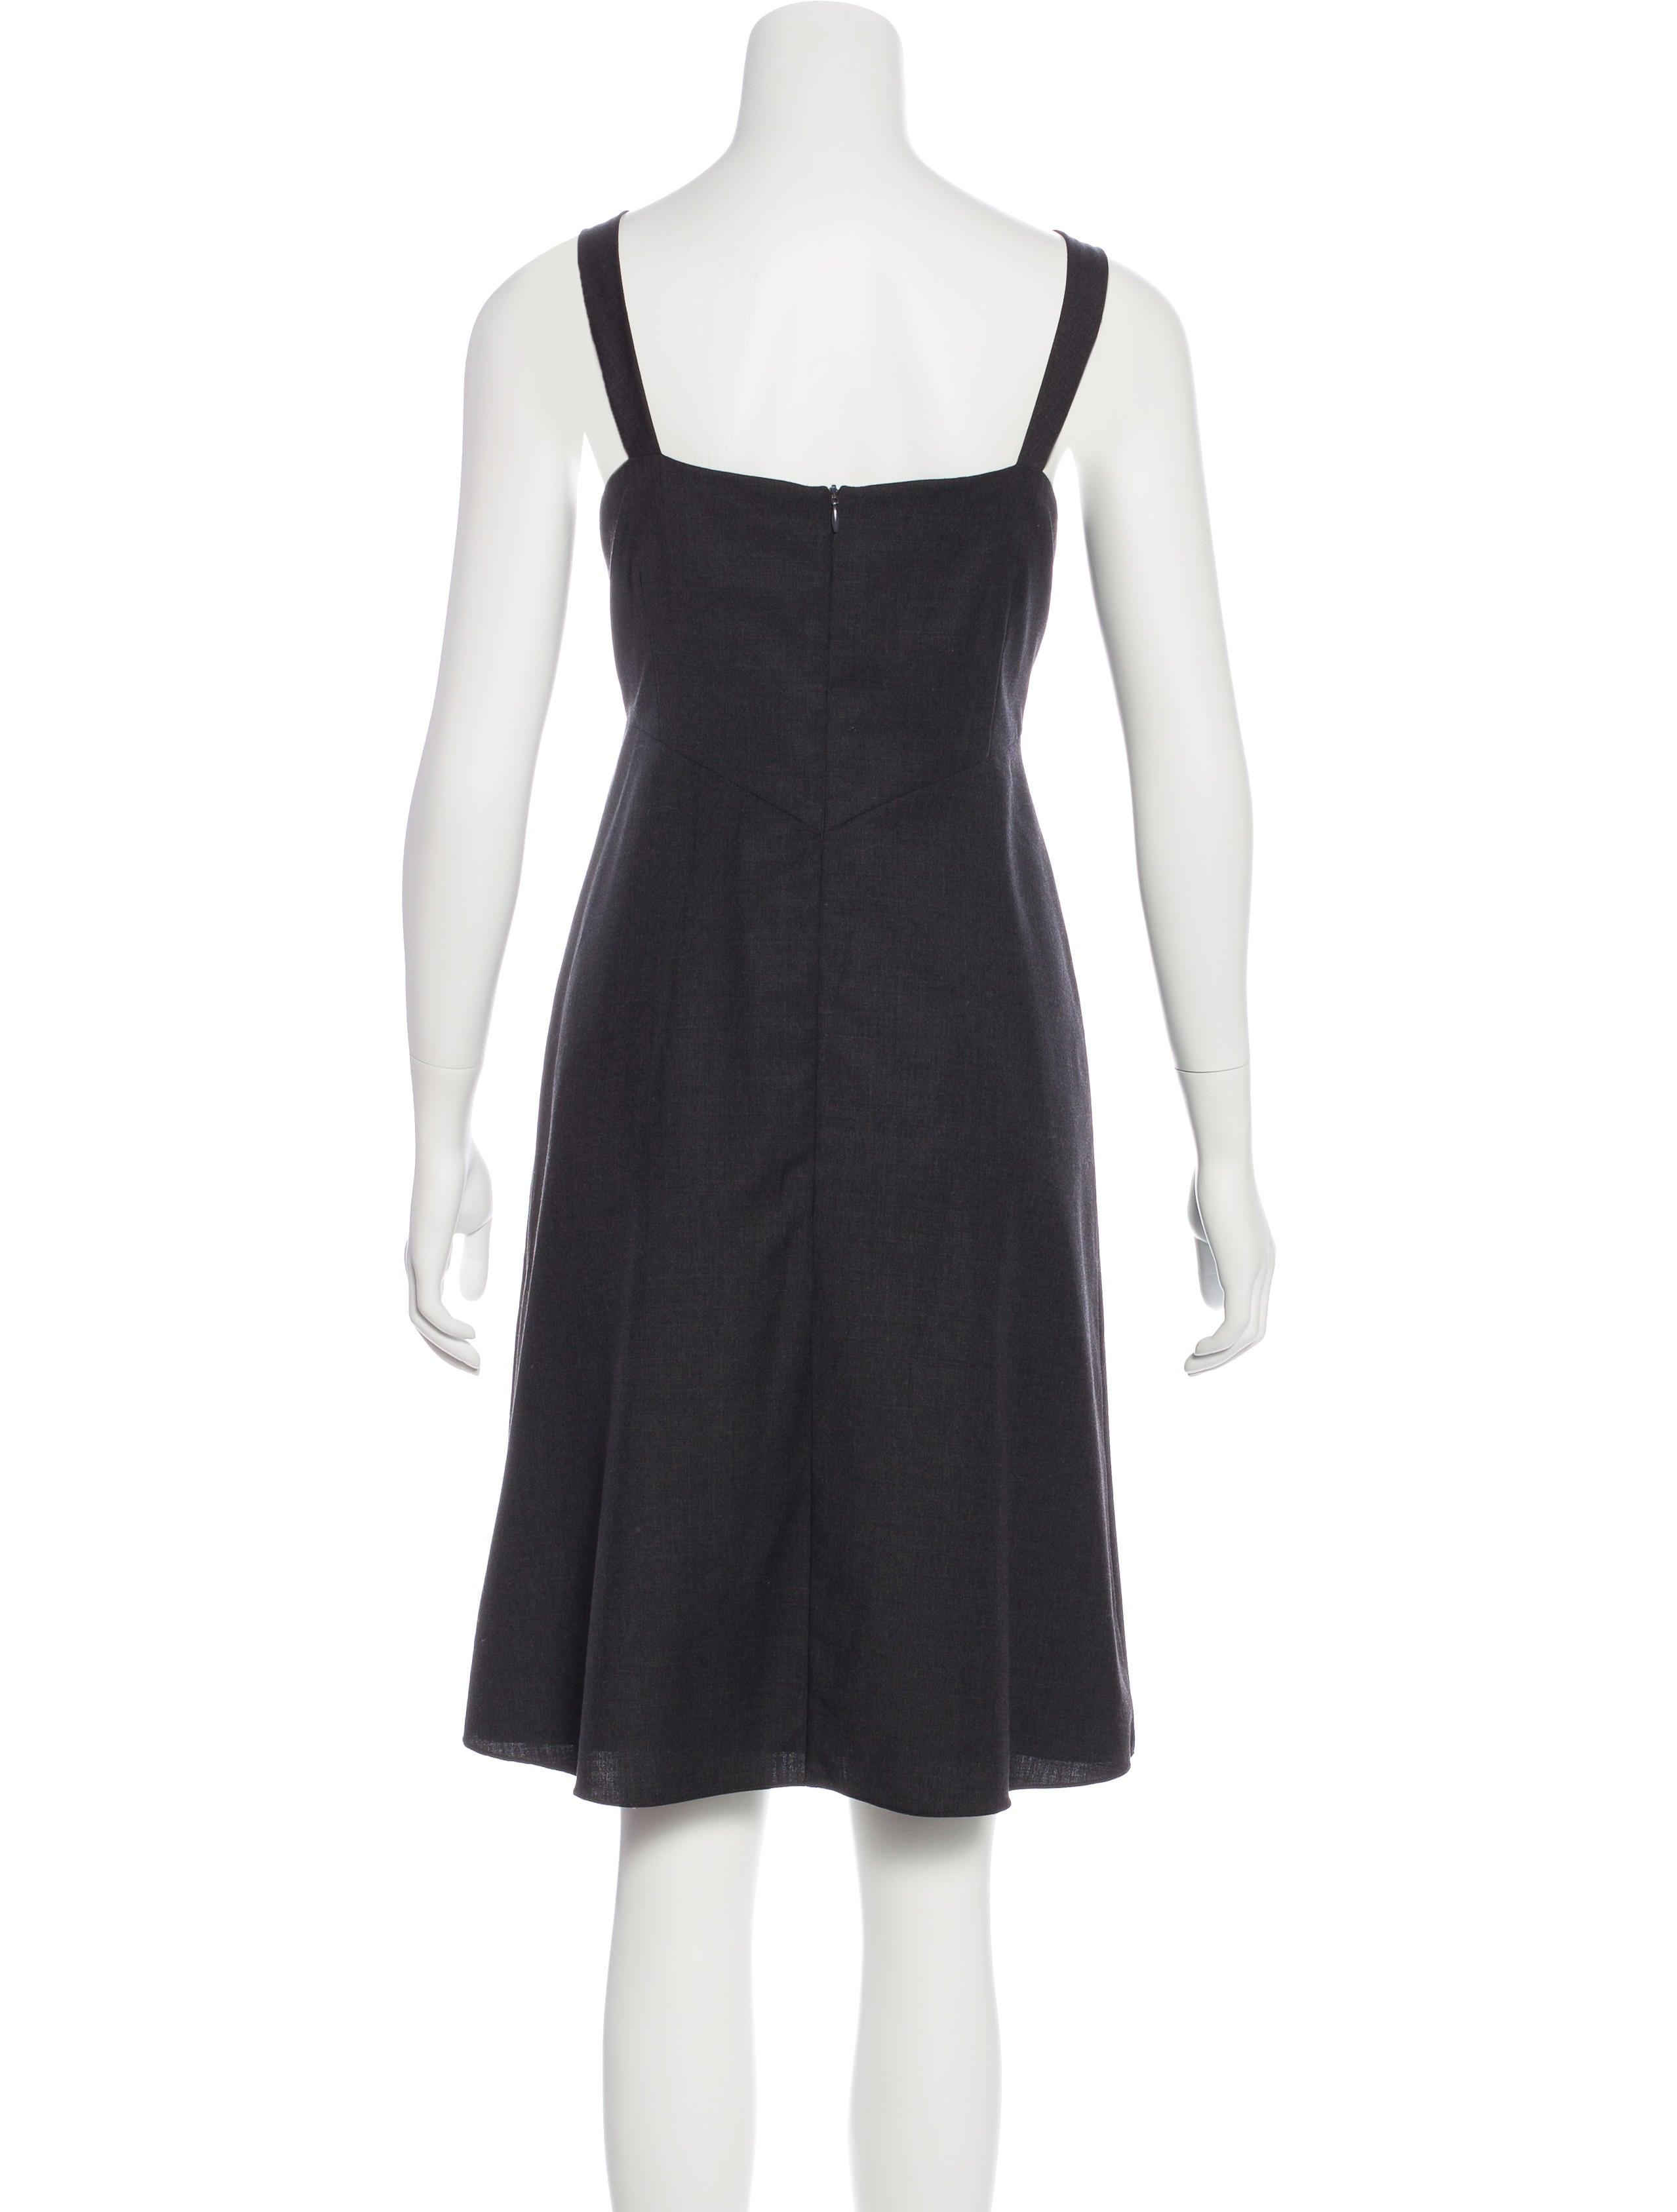 Morgane Le Fay Sleeveless Sheath Dress Clothing